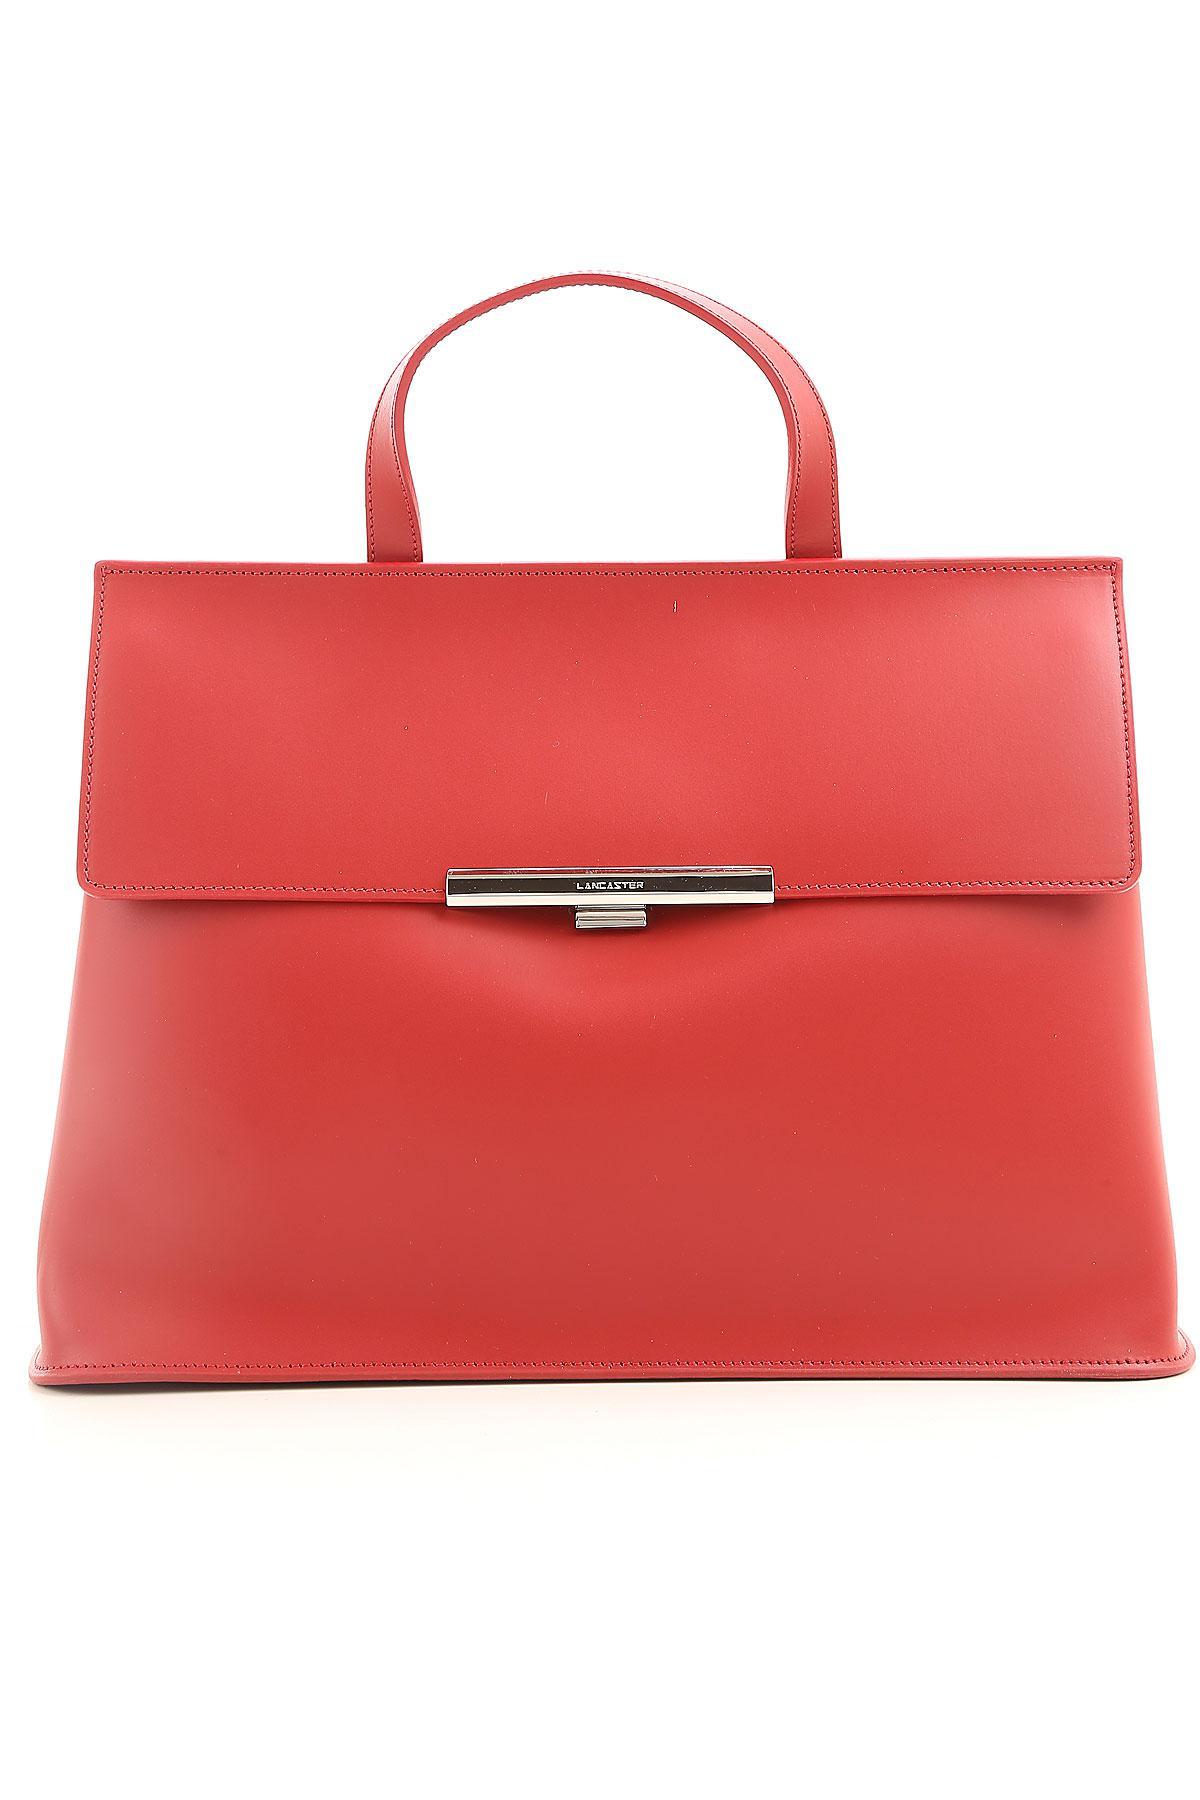 281e4e9f892 Lyst - Lancaster Tote Bag On Sale in Red